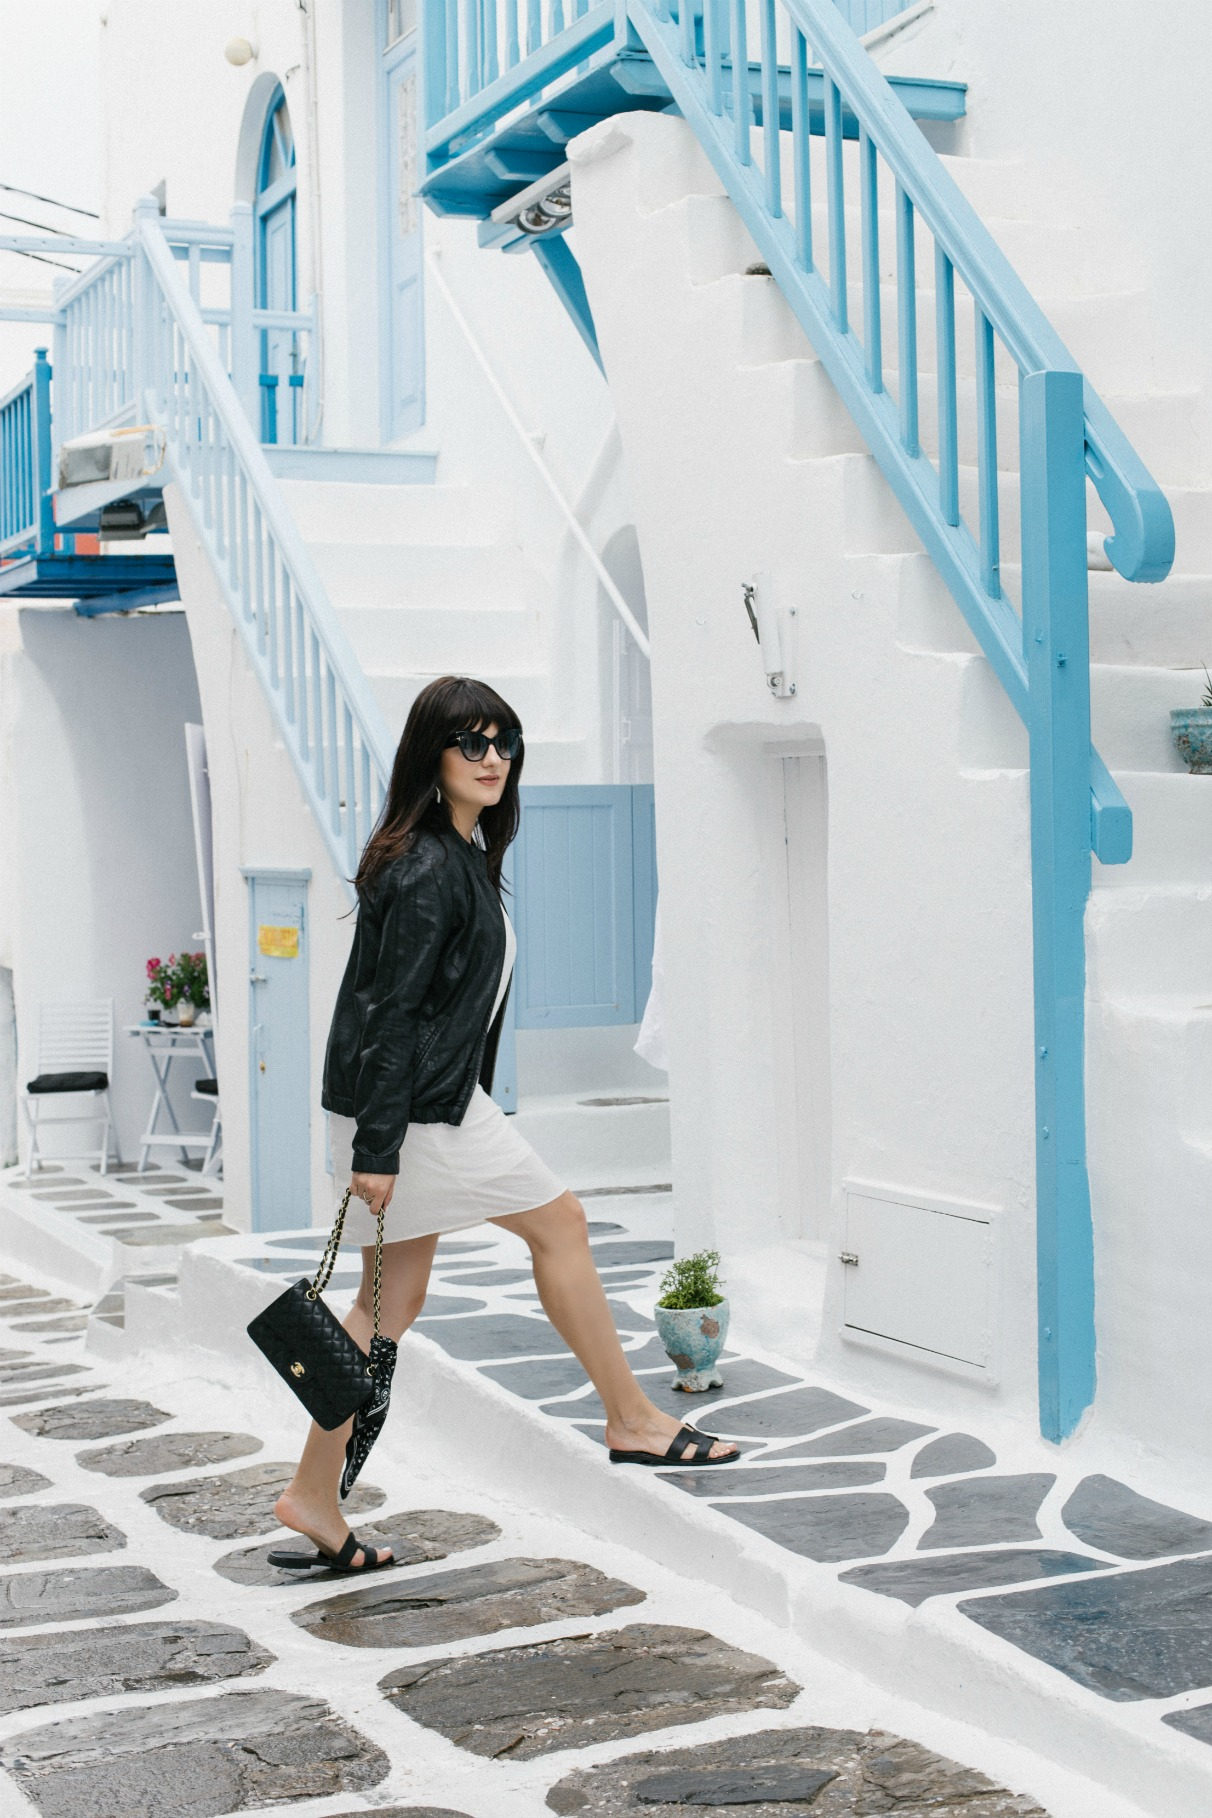 manila-grace-black-white-dress-bomber-jacket-mykonos-town-2016-disi-couture-01